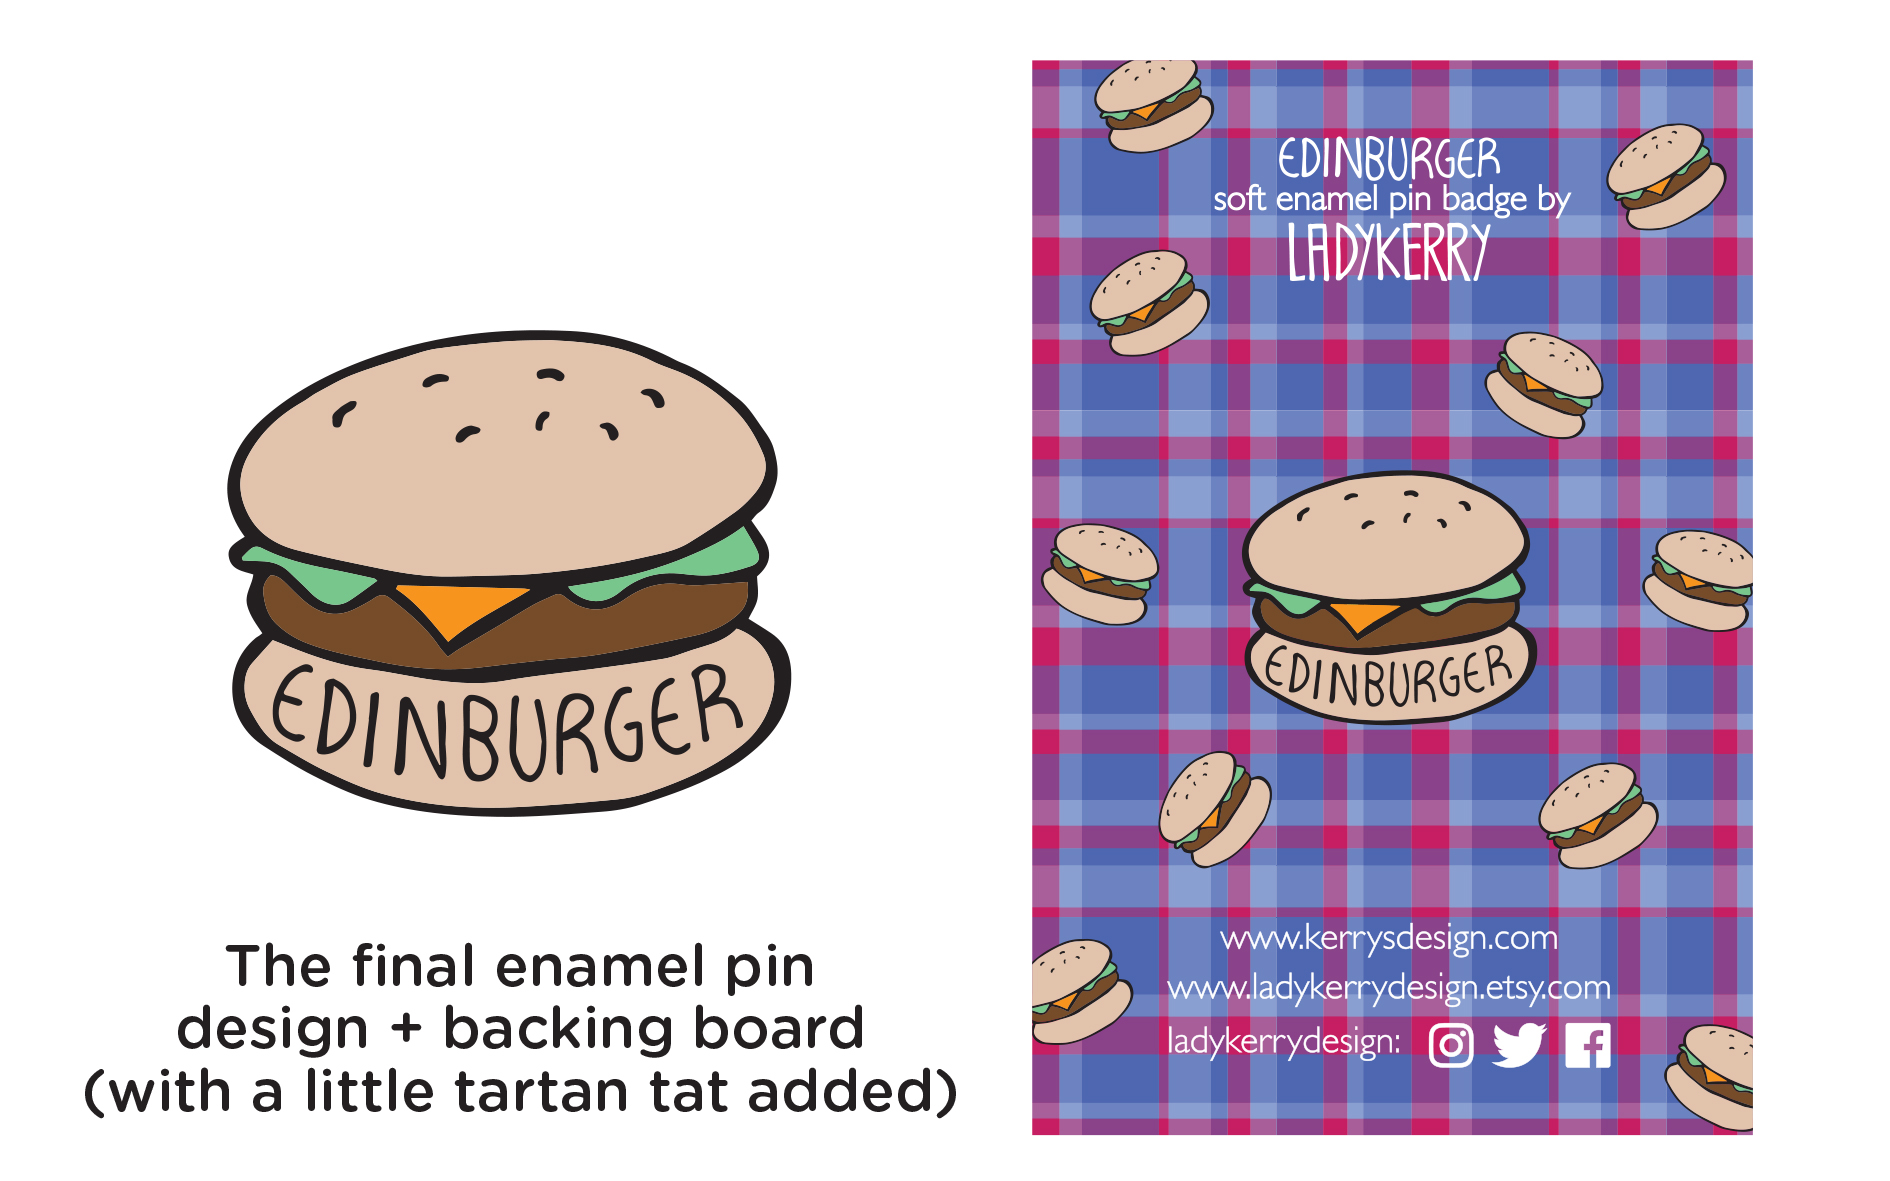 Edinburger Edinburgh Burger Enamel Pin - Ladykerry